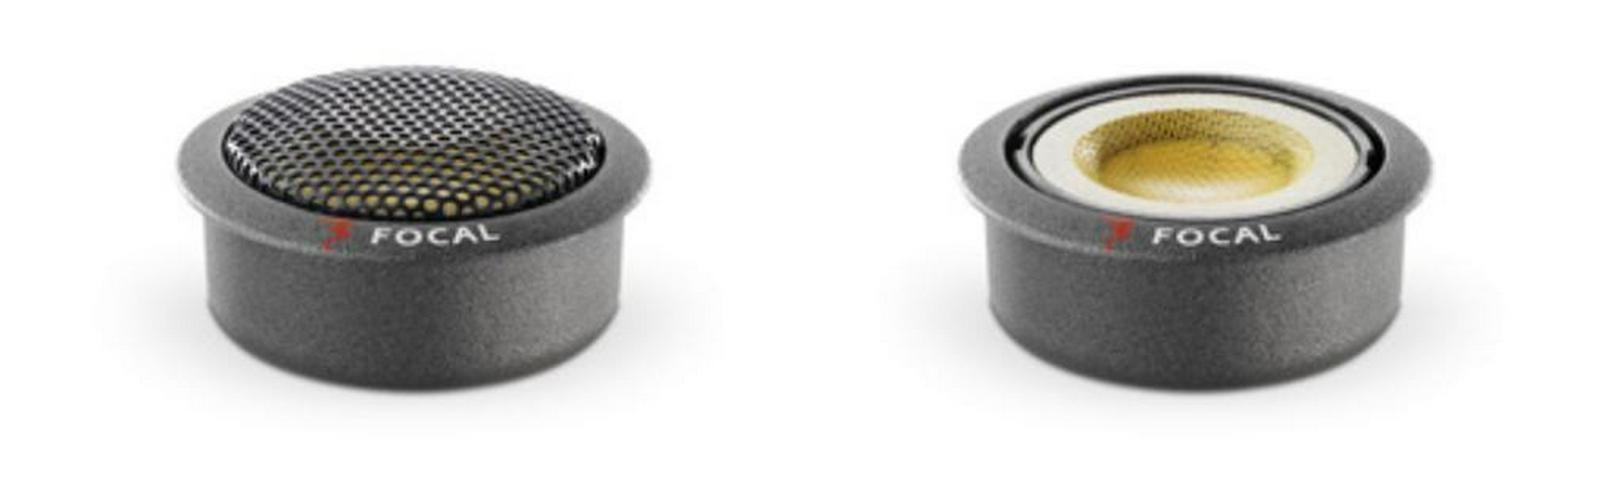 Focal K2Power Hochtöner TNK - Paar - Lautsprecher, Subwoofer & Verstärker - Bild 1